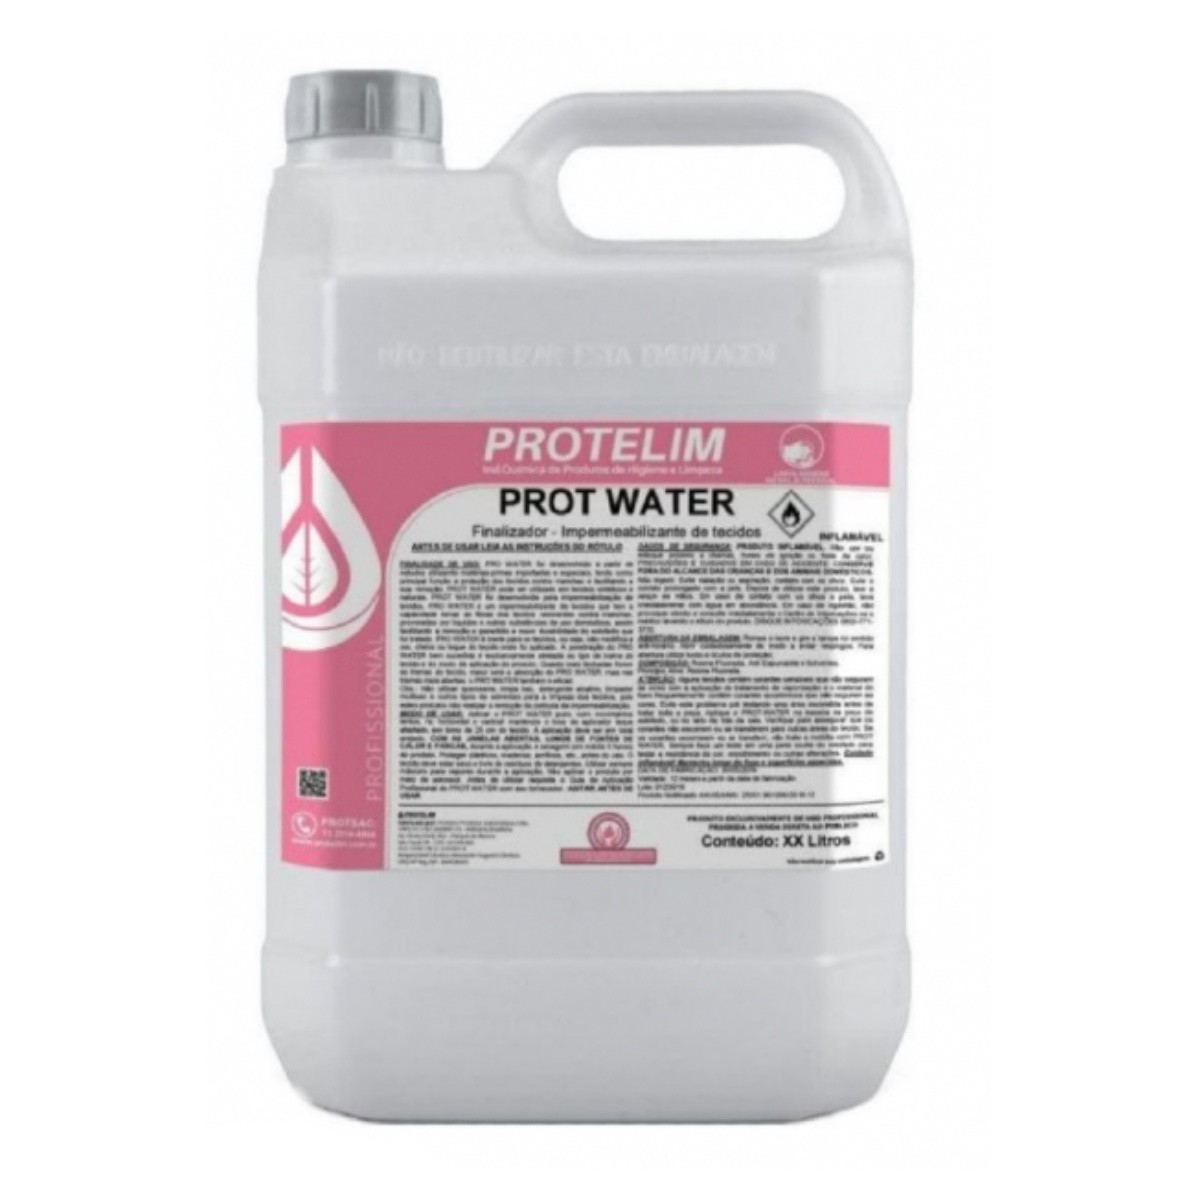 Kit Impermeabilizante para Estofado e Tecido Prot-Water Protelim 20 Litros